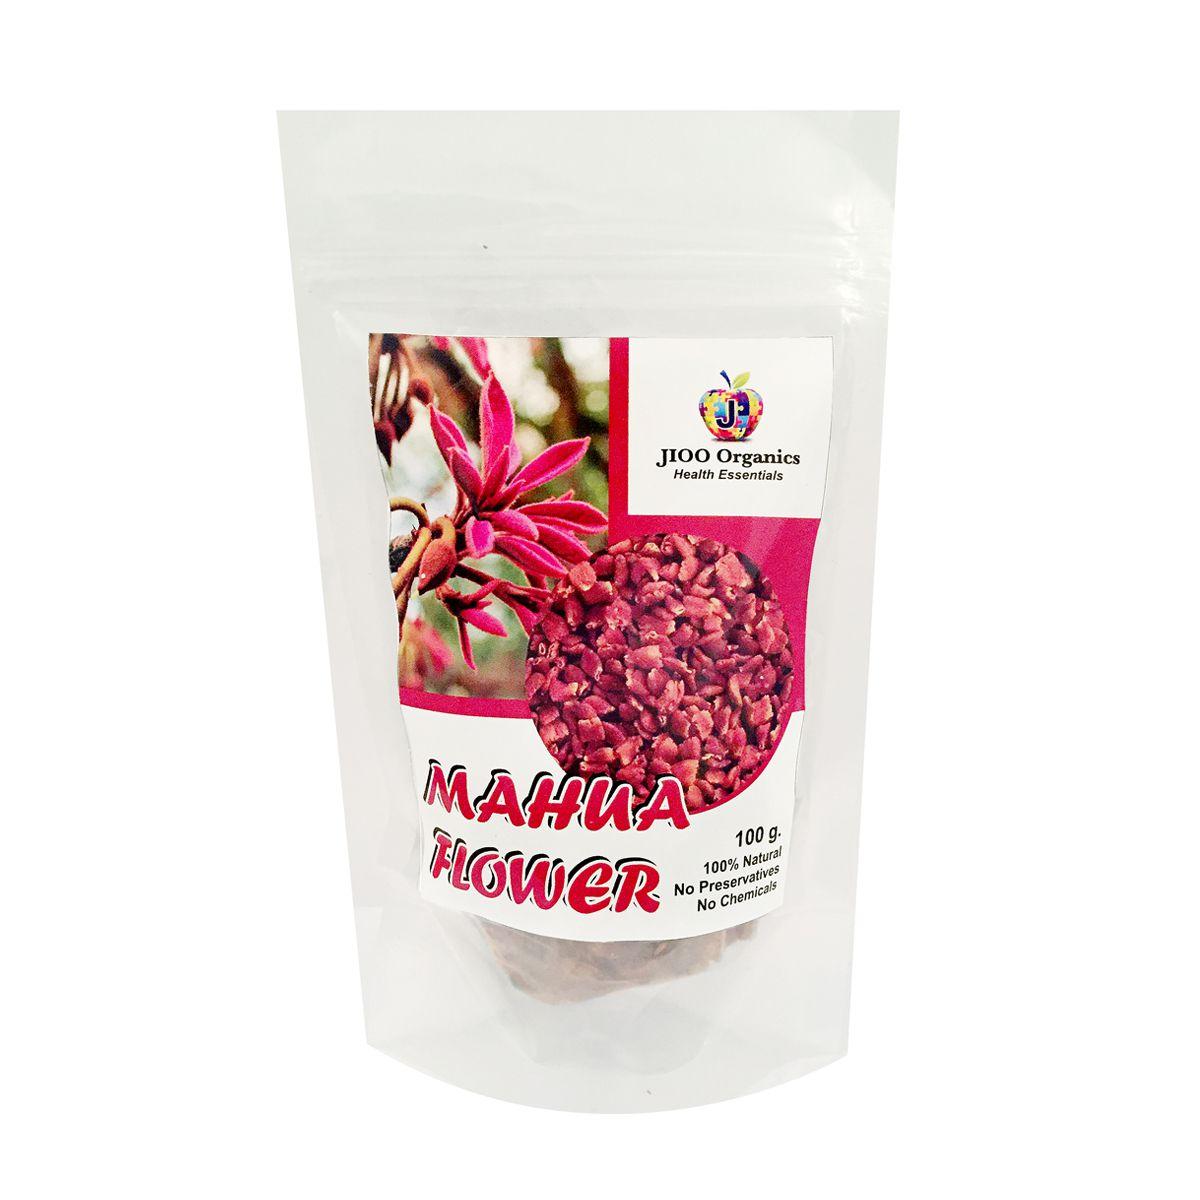 Jioo Organics Mahua Fruit Raw Herbs 1 gm